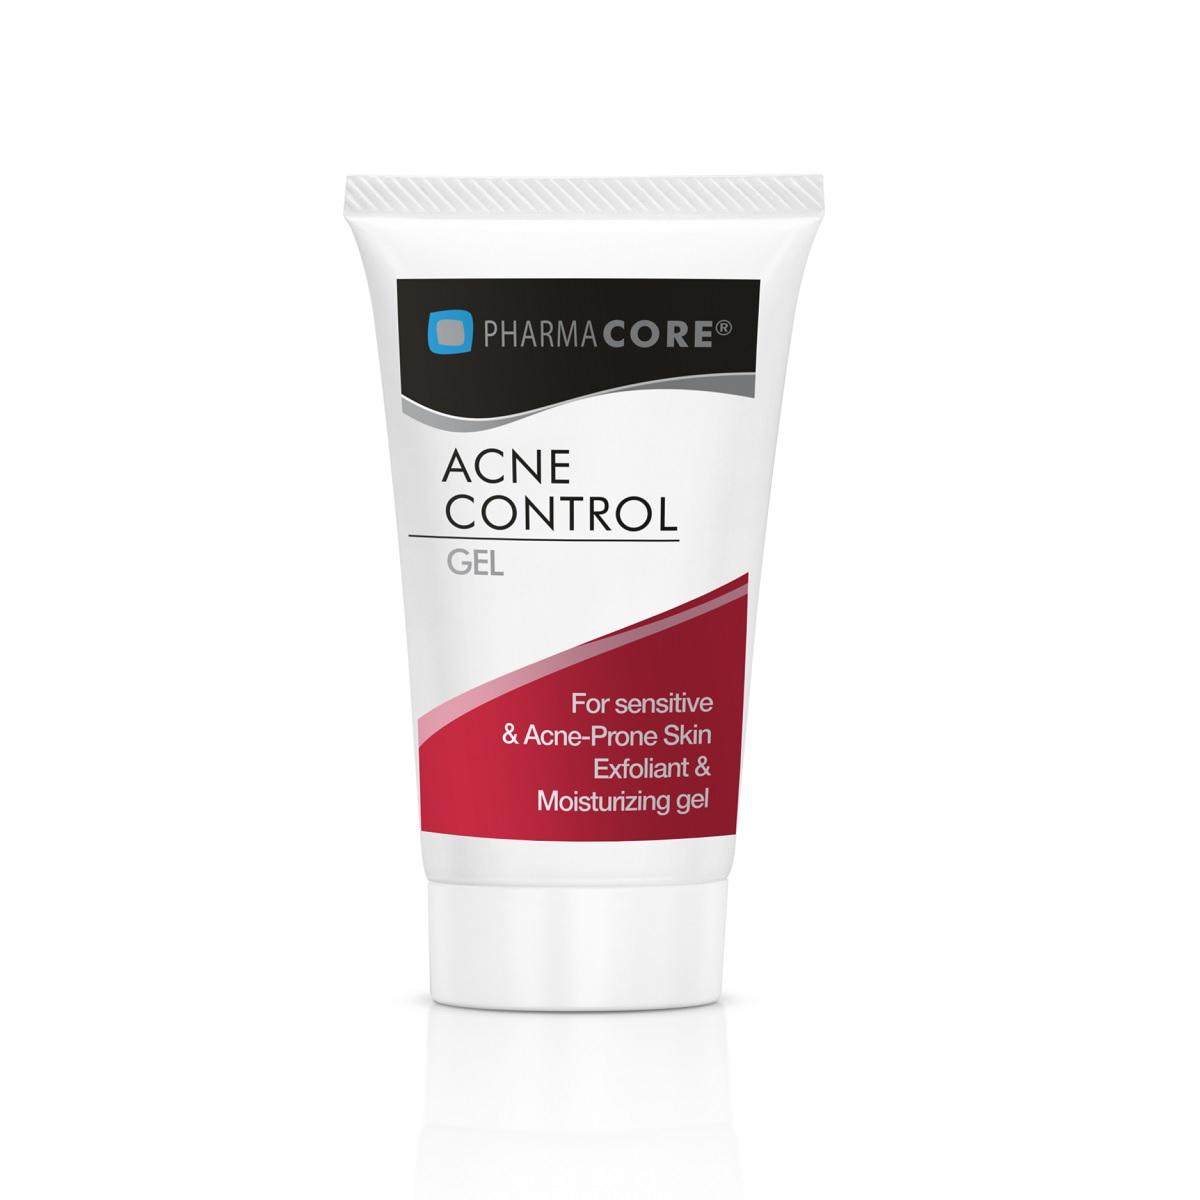 Gel tratament Acne Control, 50ml, Pharmacore drmax.ro